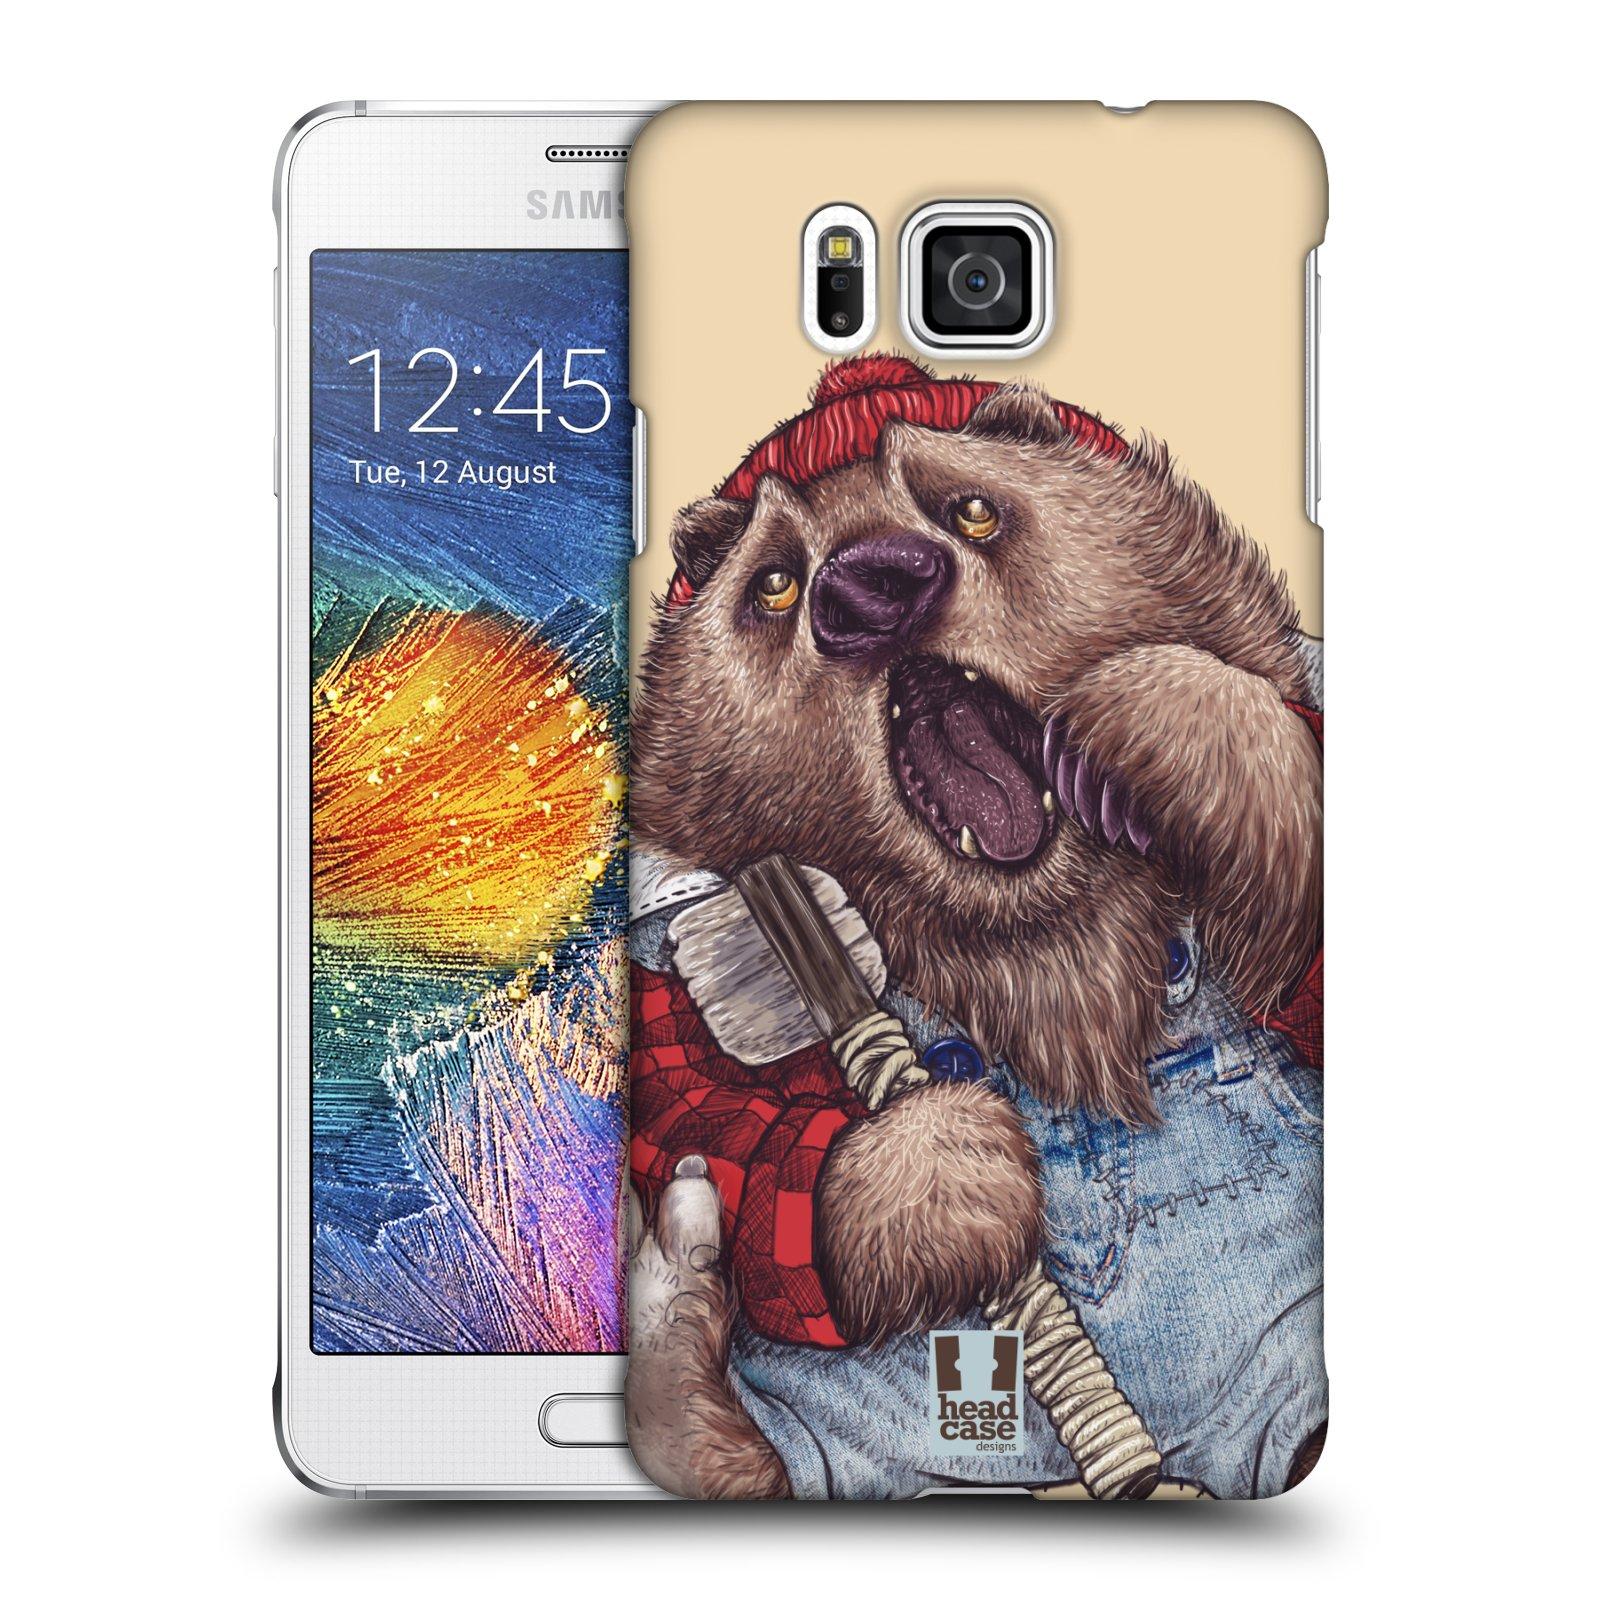 HEAD CASE plastový obal na mobil SAMSUNG Galaxy Alpha (G850) vzor Kreslená zvířátka medvěd